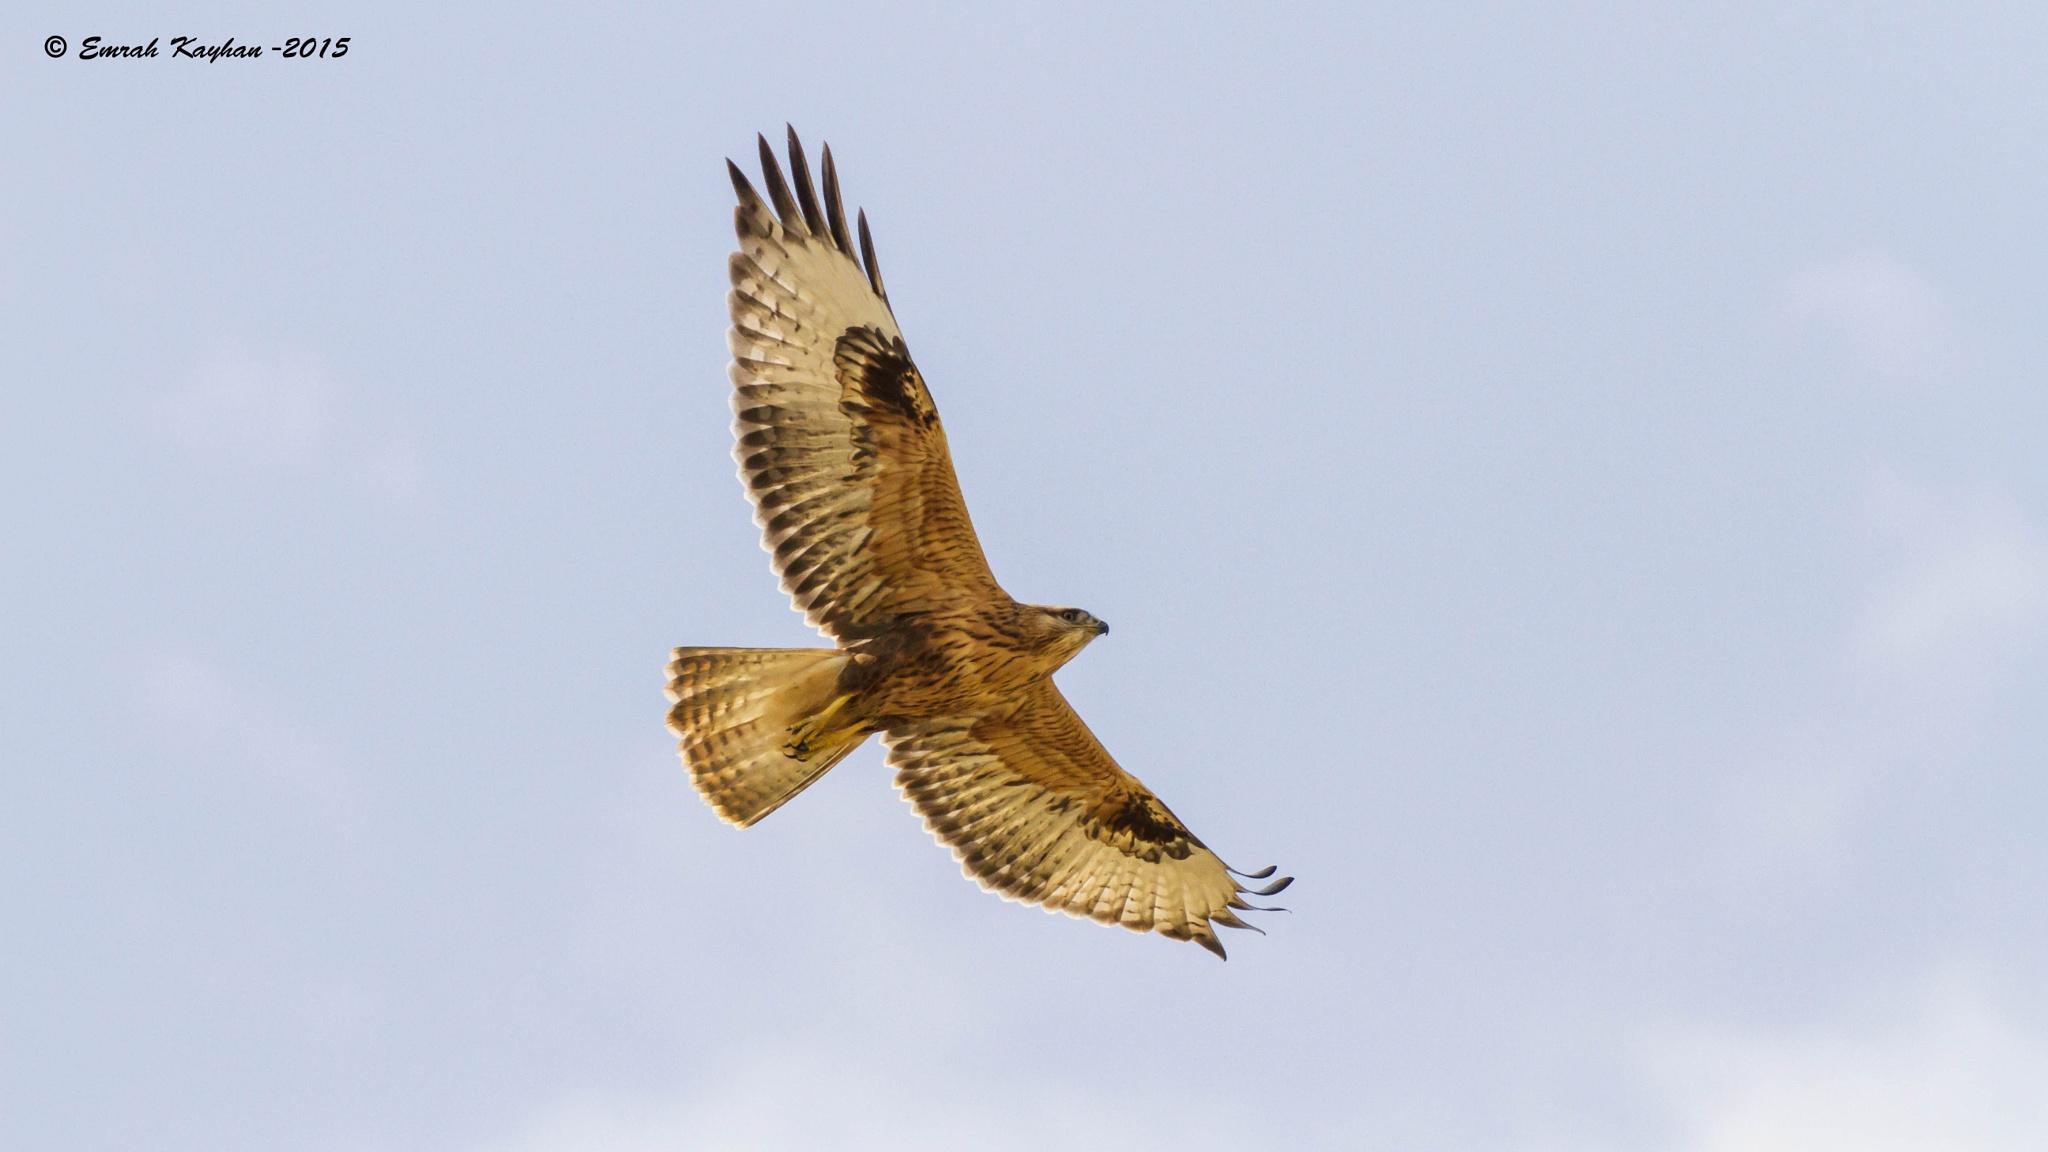 Long-legged Buzzard by EmrahKayhan